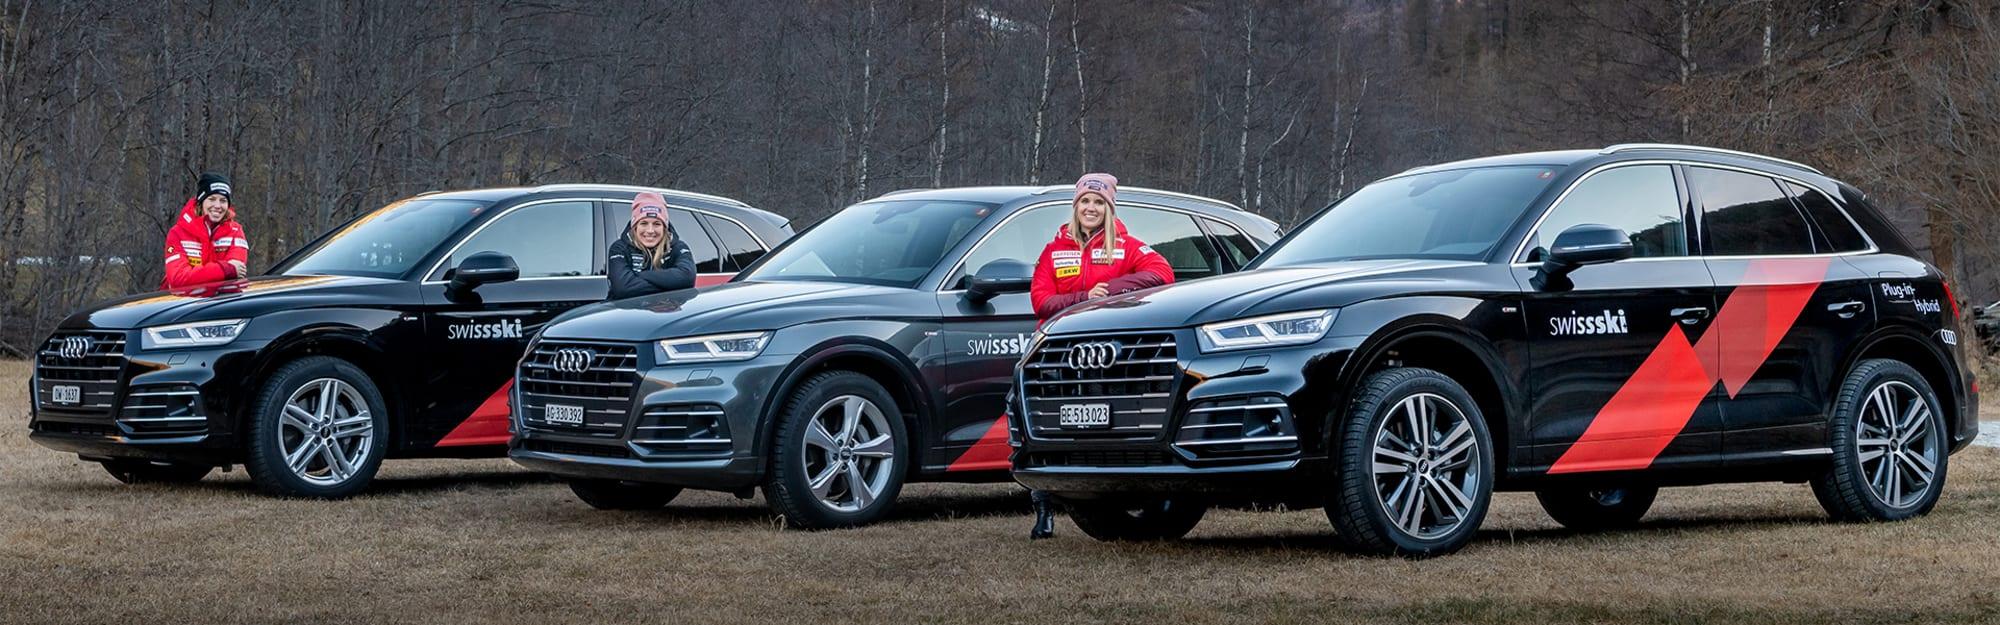 Audi_RangeSwissSki_Update_Haendlerwebseite_1920x600px